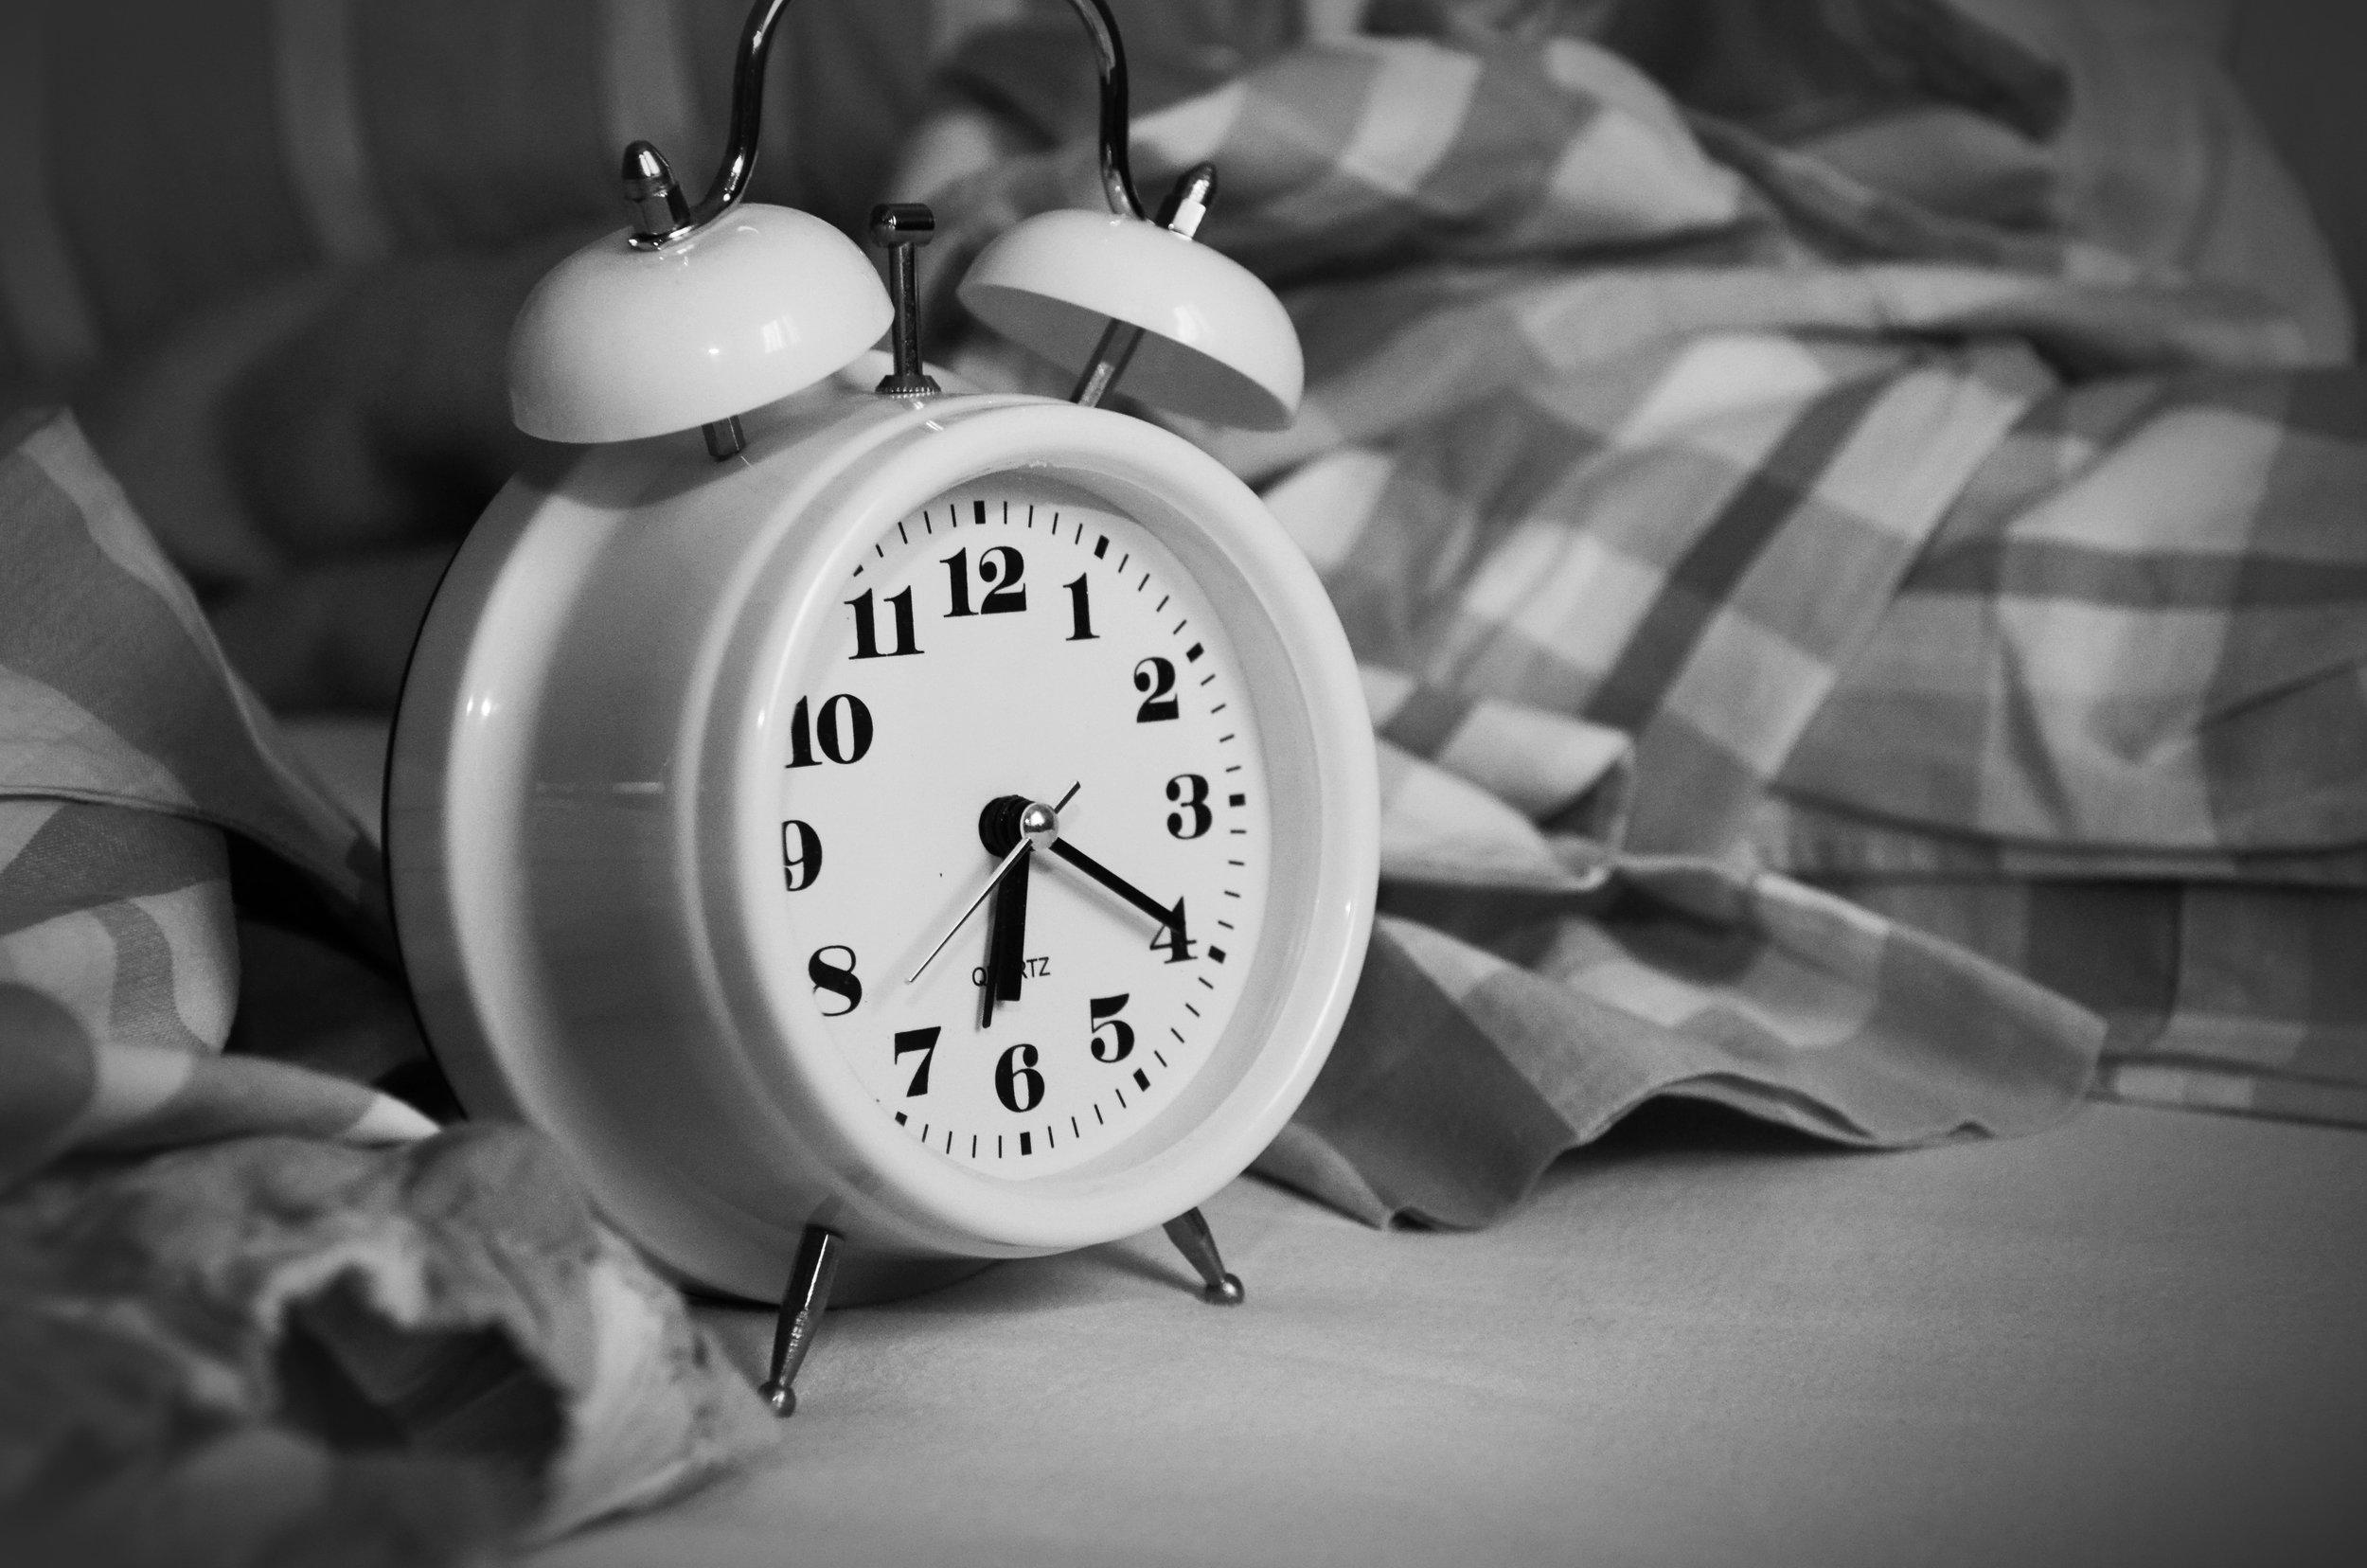 alarm-clock-analogue-bed-271818.jpg